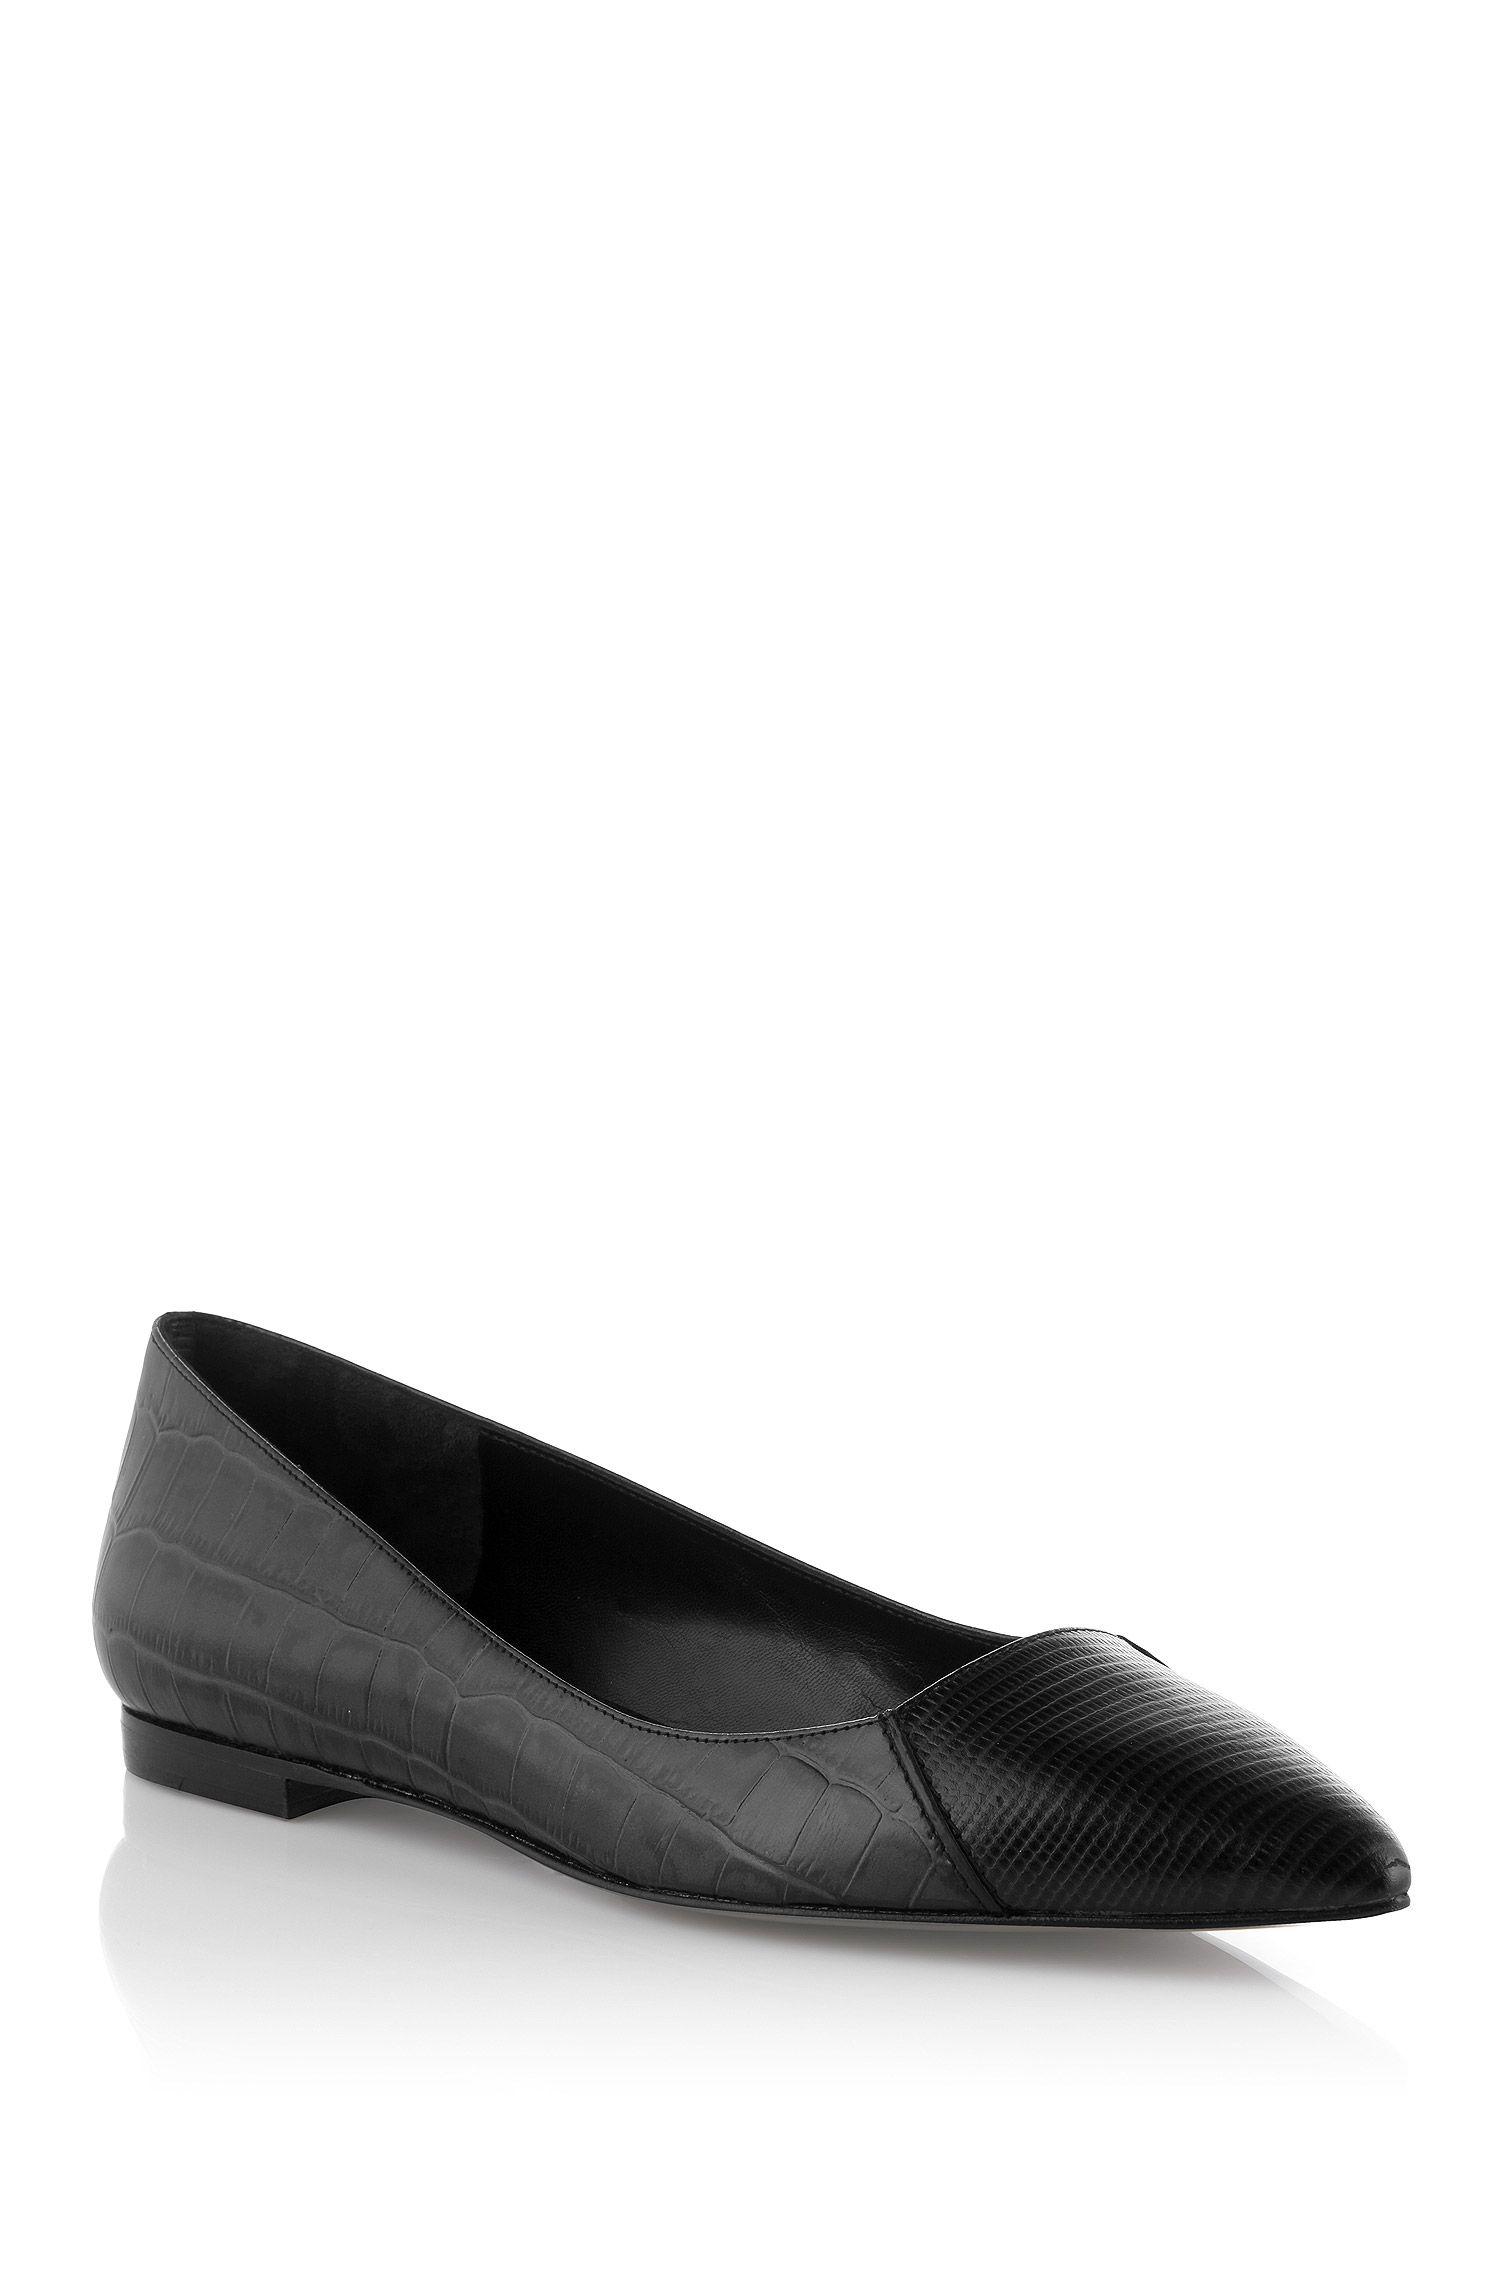 Ballerina ´Crela` aus Leder mit Kroko-Prägung